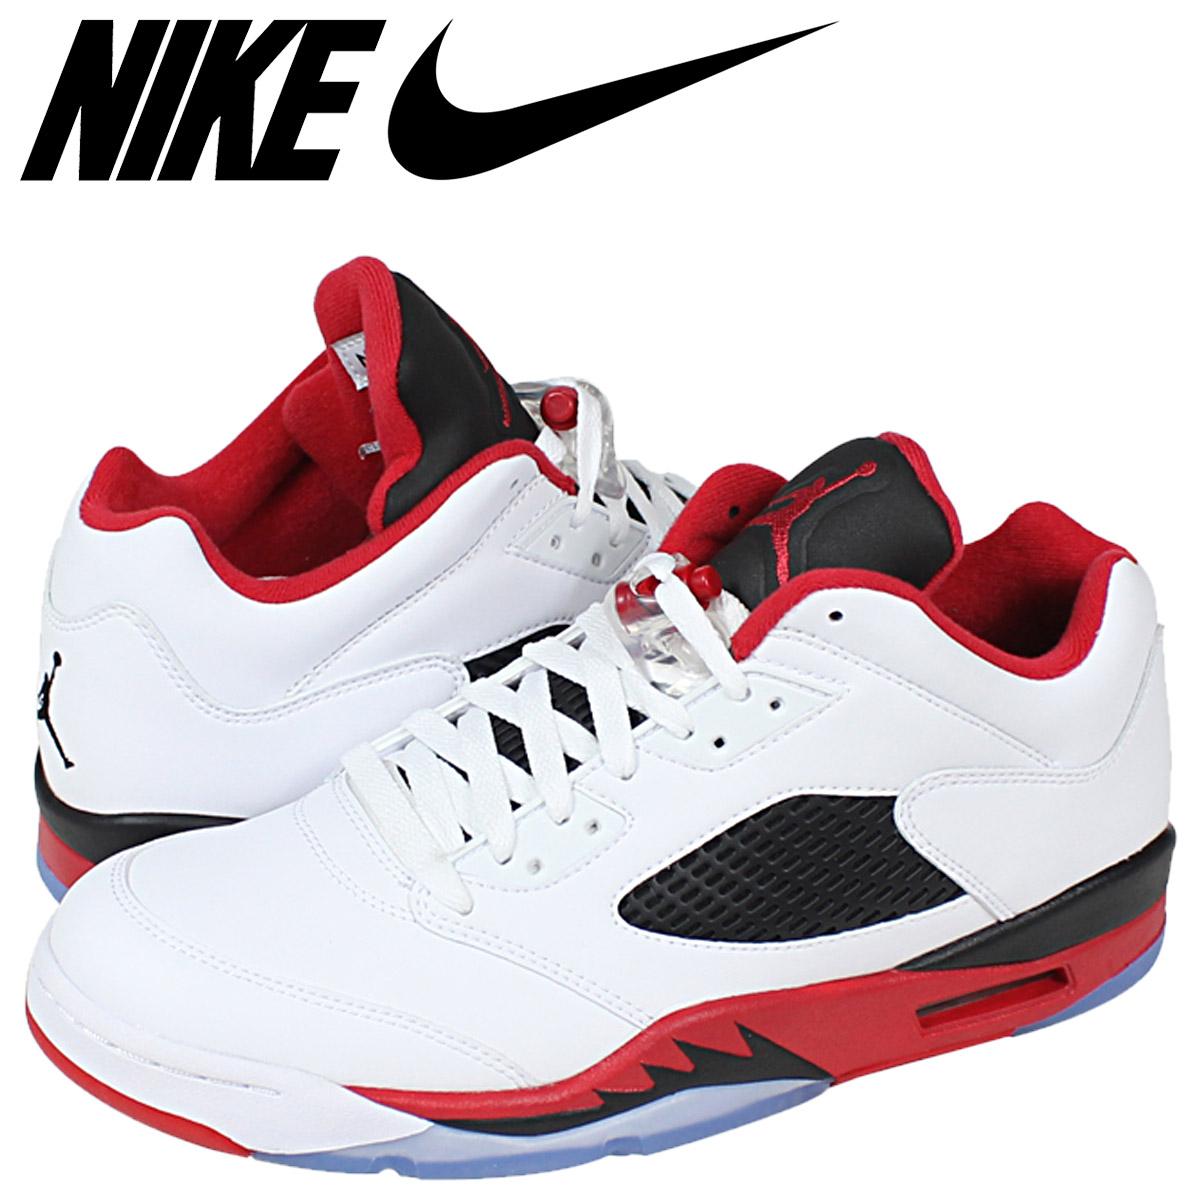 new product b56dc 231c6 Nike NIKE Air Jordan sneakers AIR JORDAN 5 RETRO LOW ALTERNATE 90 Air  Jordan 5 alternate 819171 - 101 white mens